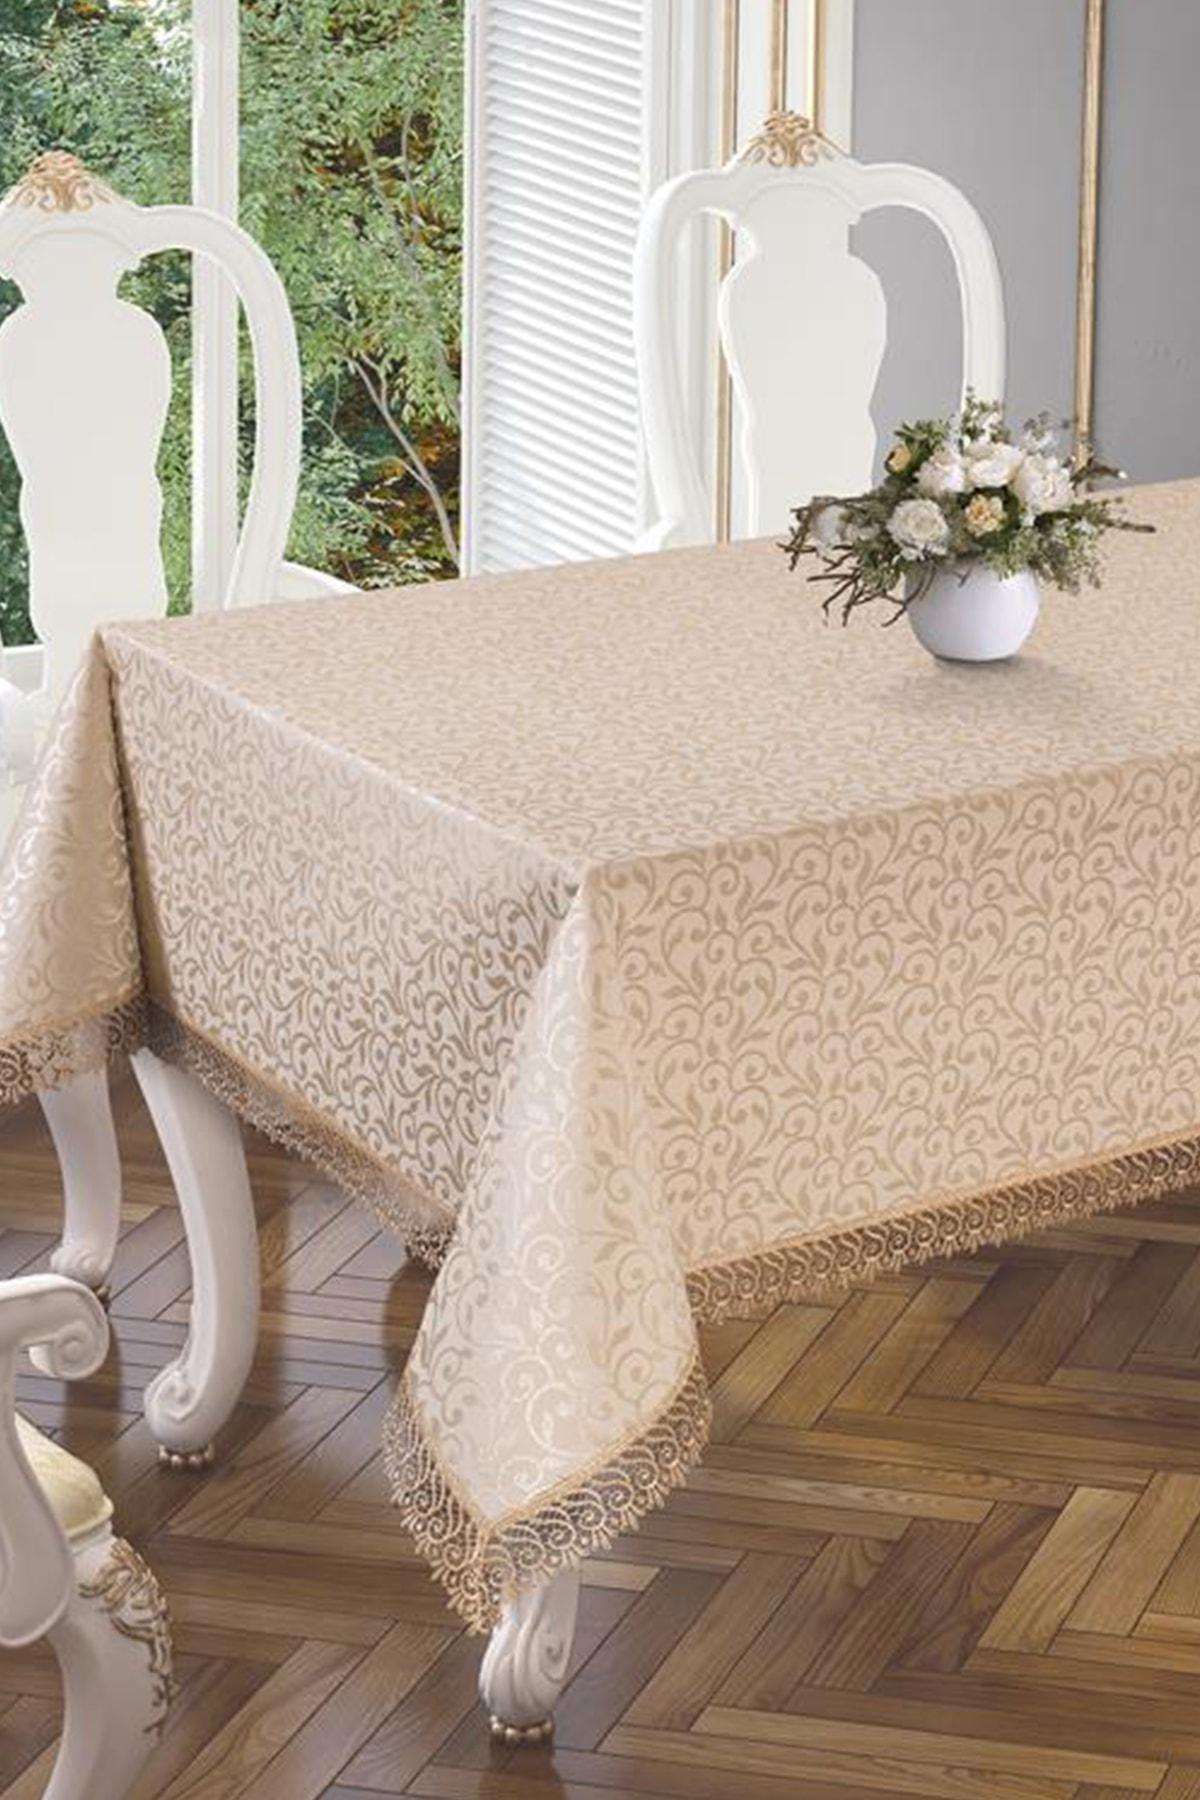 Kdk Dertsiz Es Güpürlü Masa Örtüsü - Cappucino